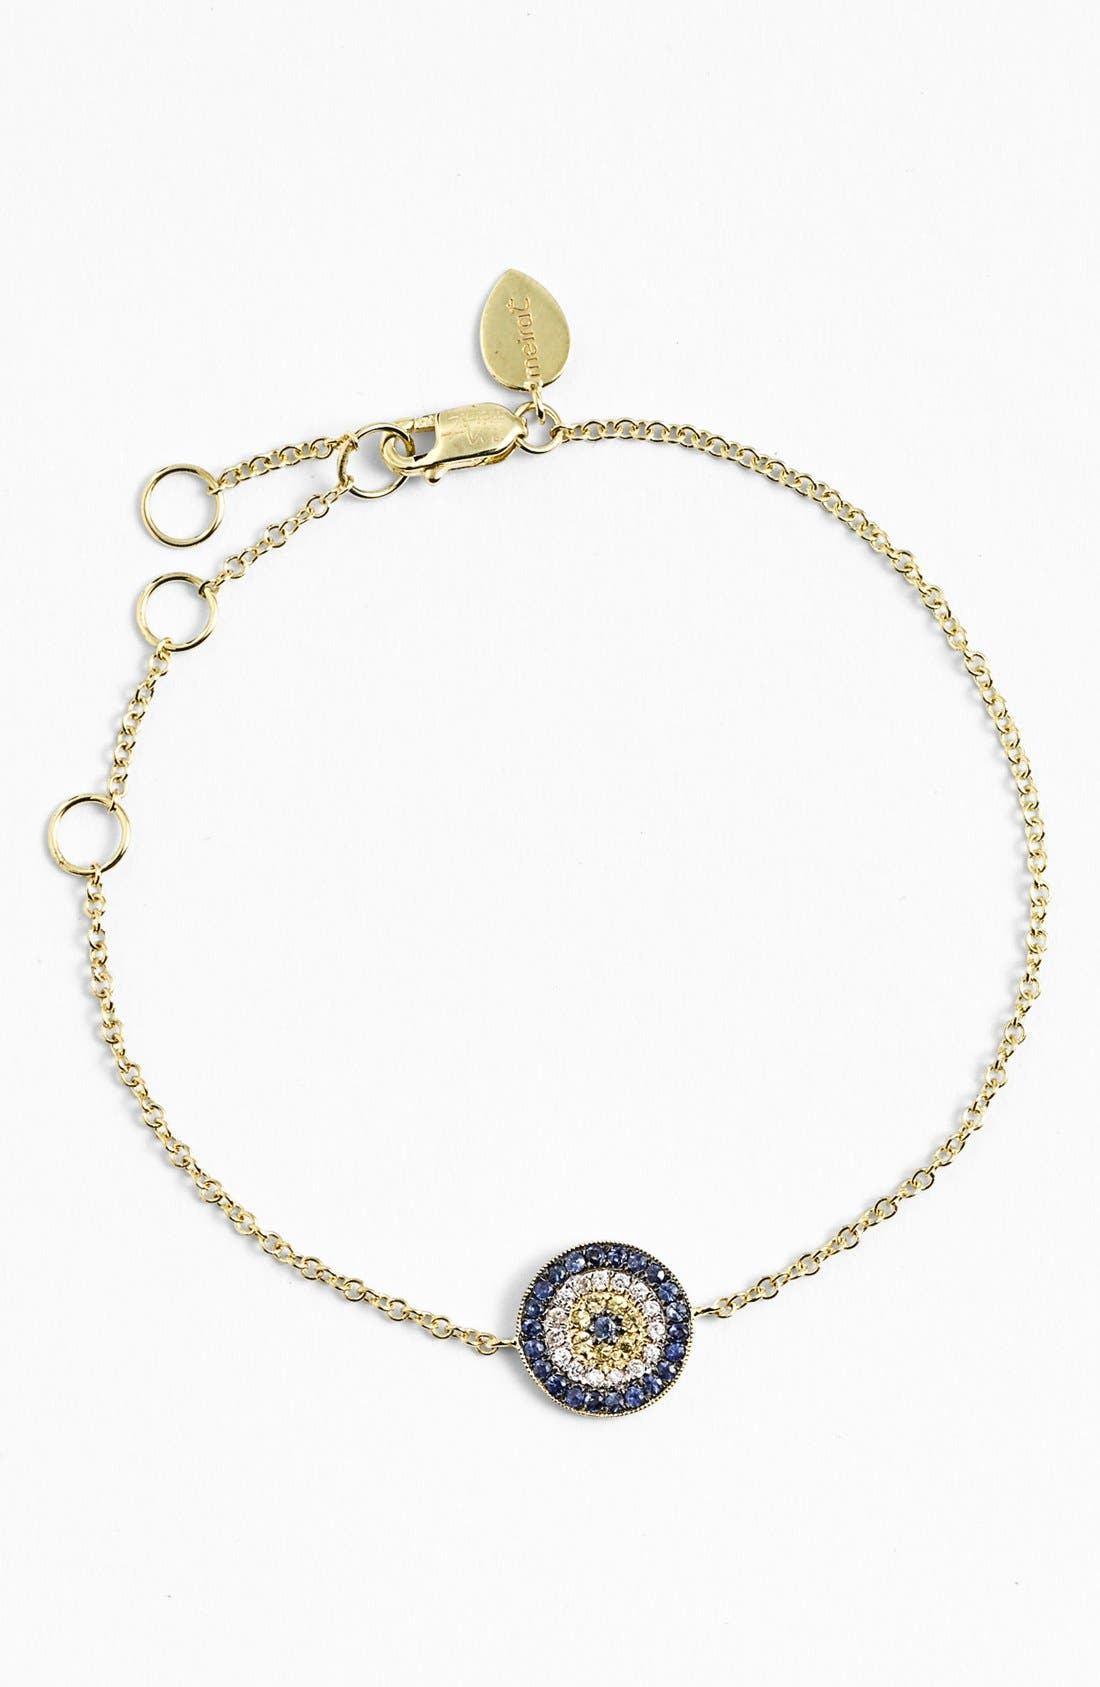 Main Image - MeiraT 'Desert Infusion' Diamond & Sapphire Station Bracelet